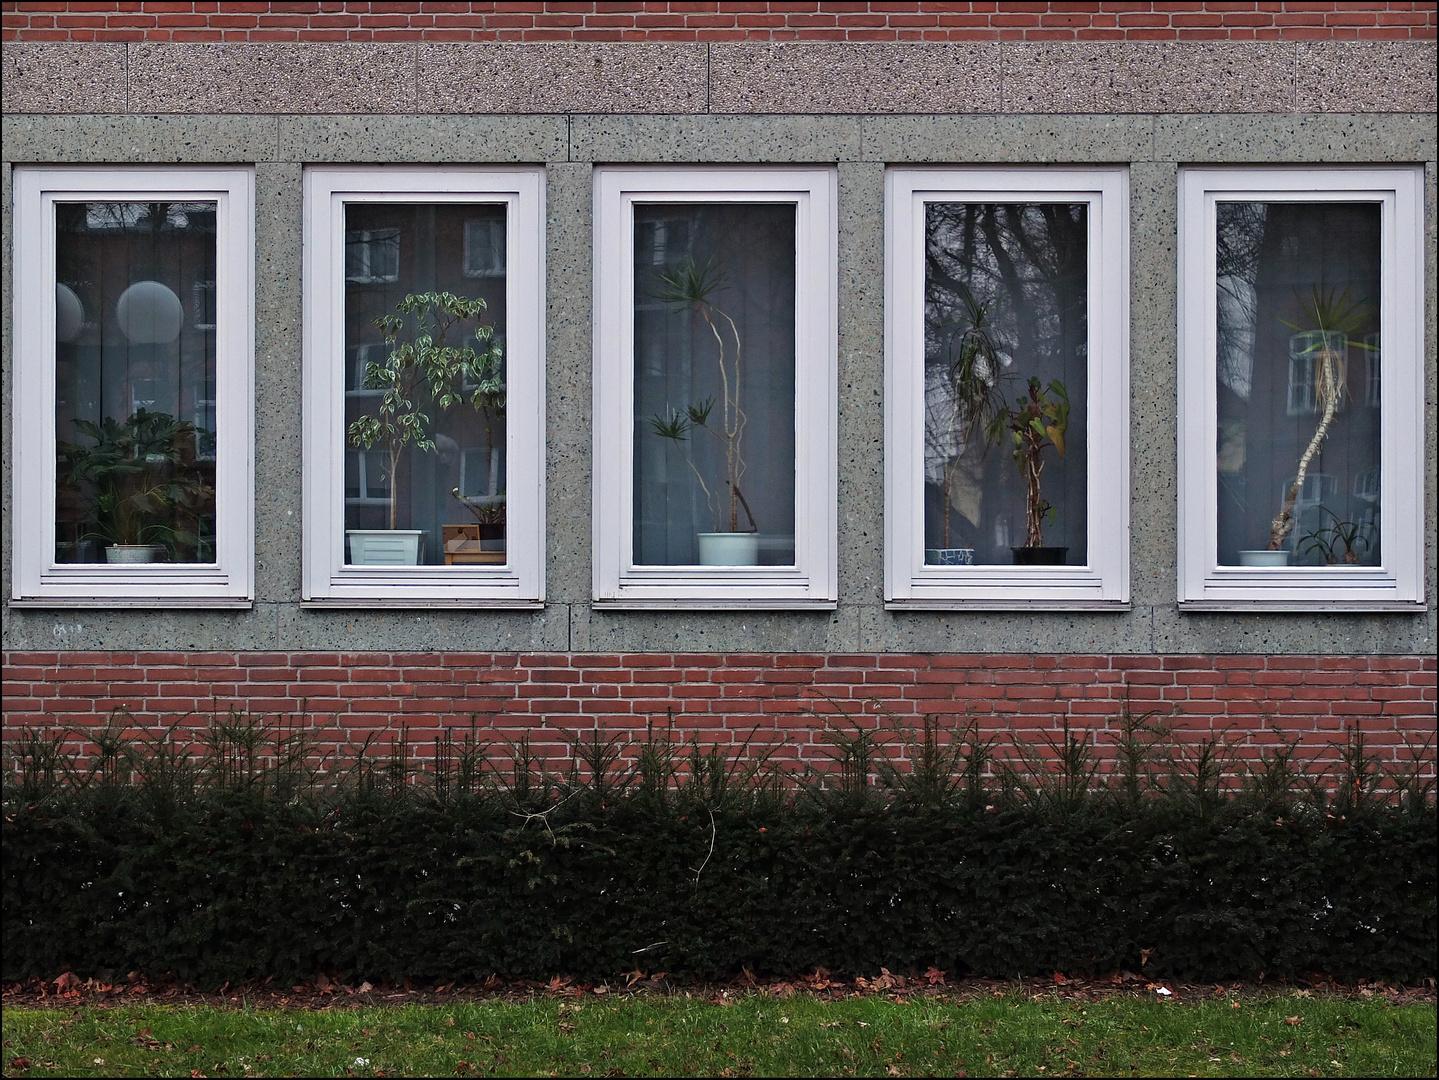 Büropflanzen